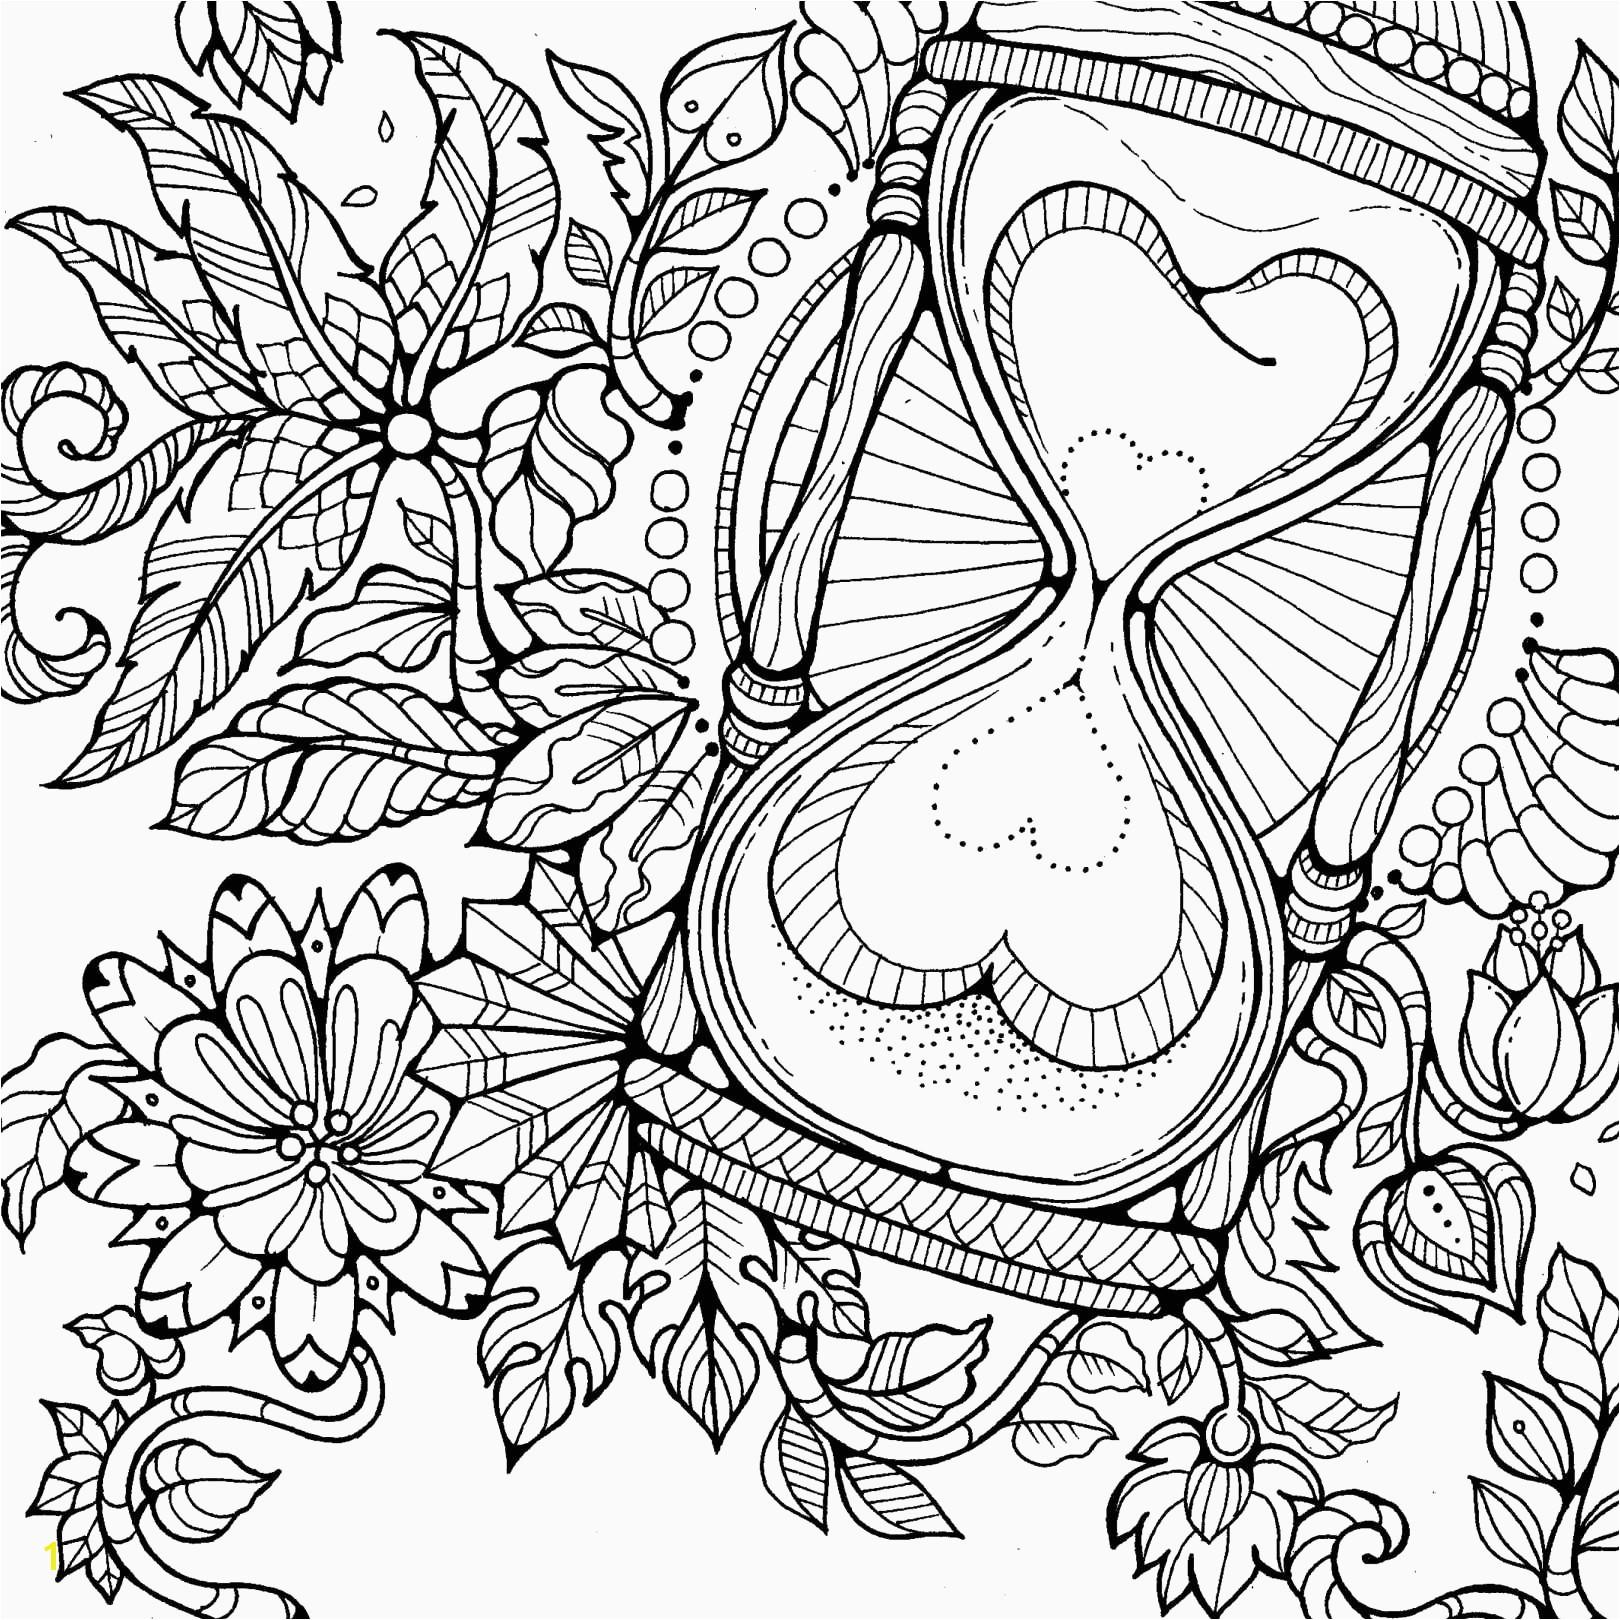 Christmas Mandala Coloring Pages Printable Awesome Coloring Pages Mandala Christmas Katesgrove